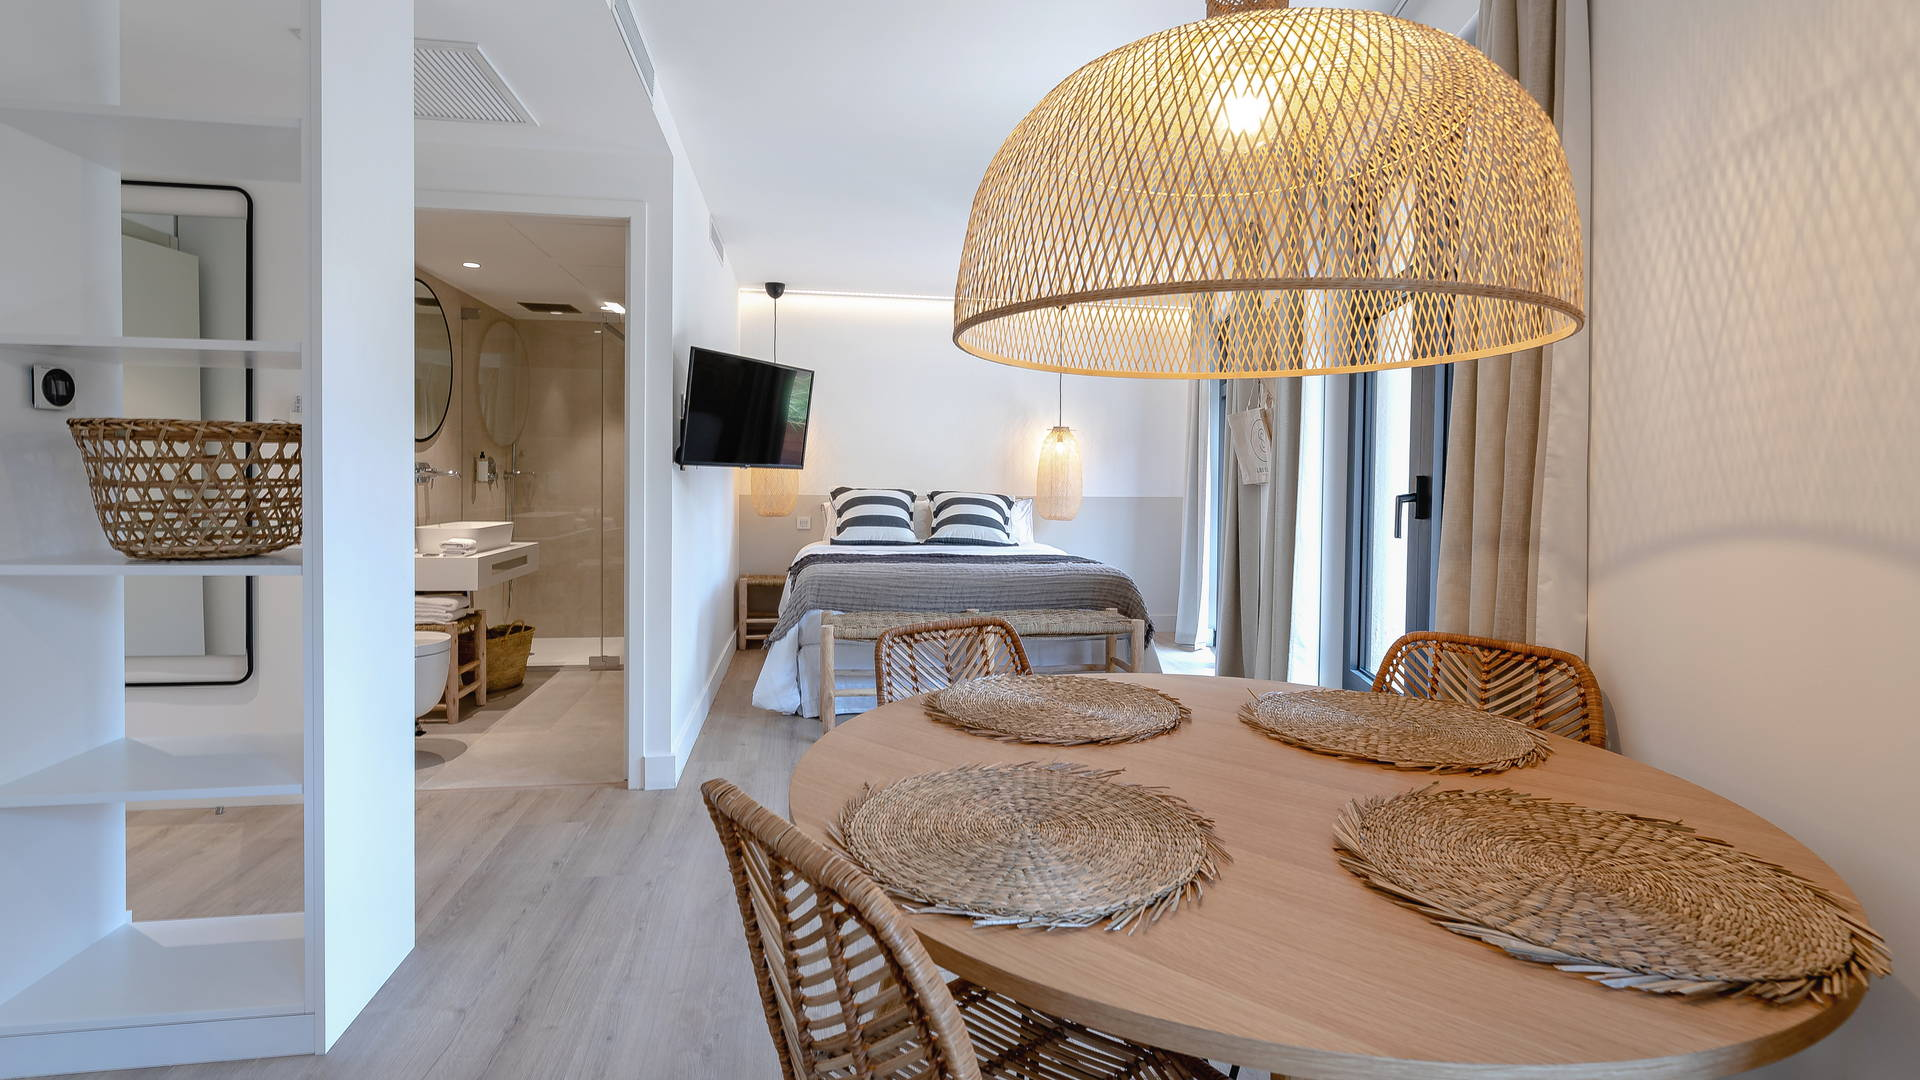 Appartement spacieux appart hotel perpignan